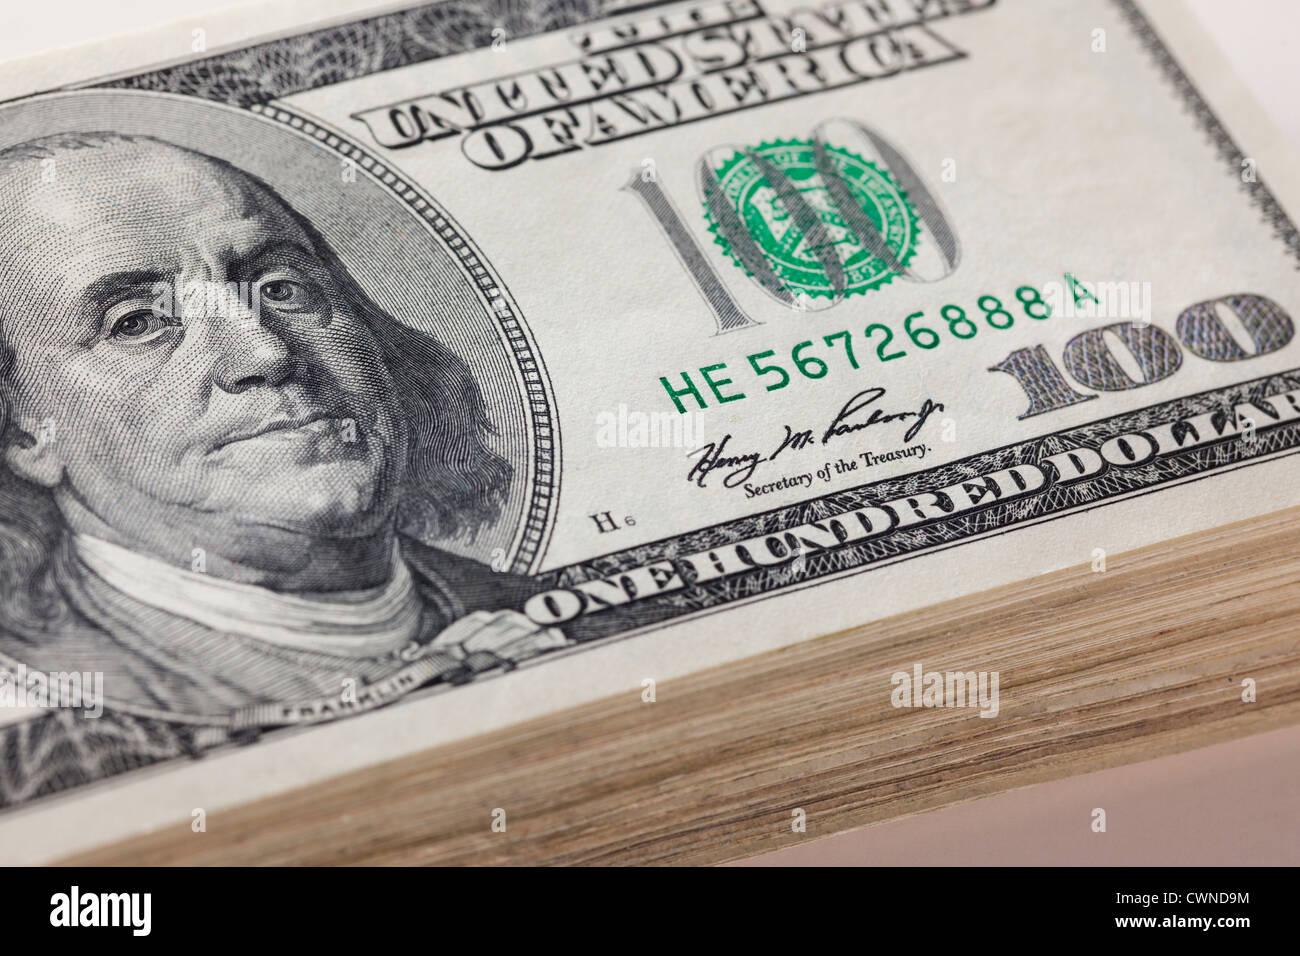 Une pile de one hundred dollar bills Photo Stock